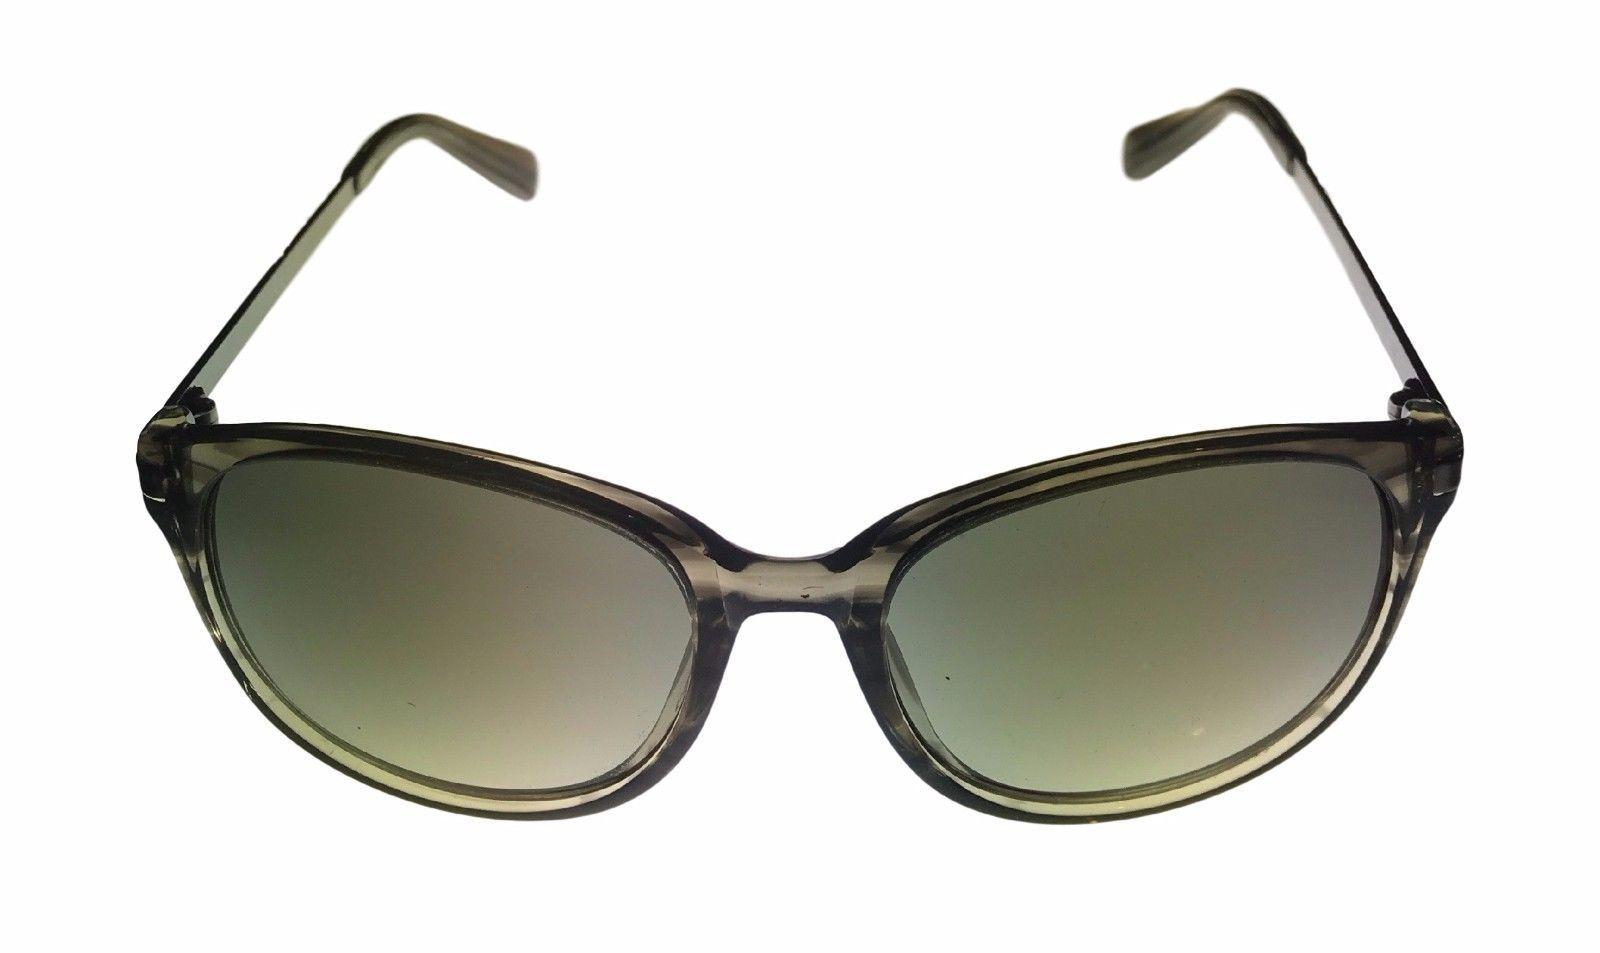 Kenneth Cole New York Mens Sunglass Soft Round Black, Smoke Lens KC7006 98F image 2